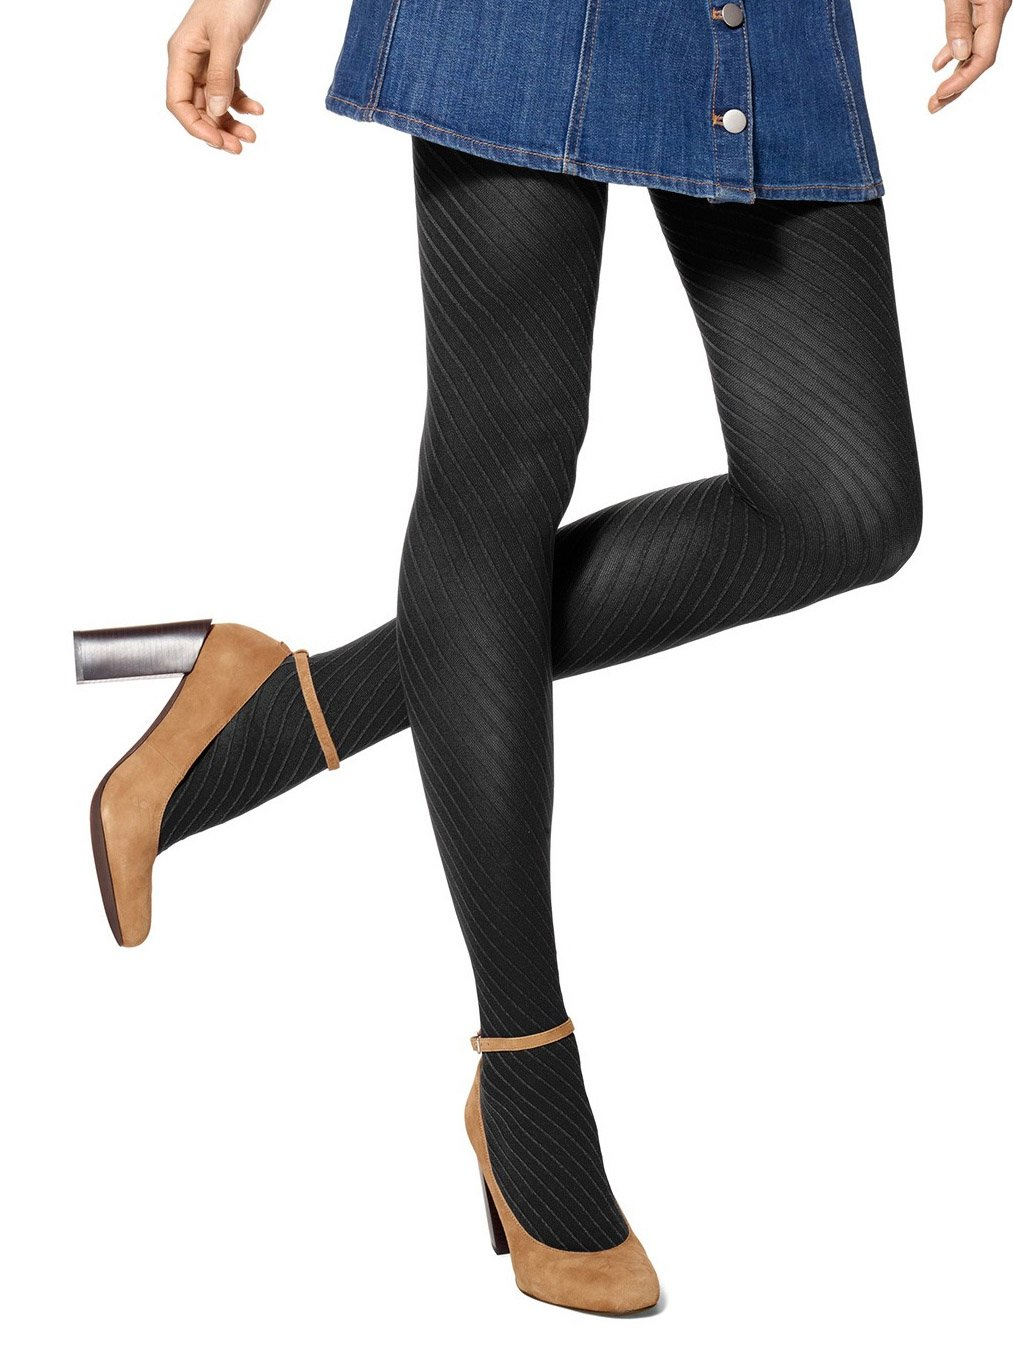 Hue Women's Diagonal Rib Control Top Tights, Black, S/M